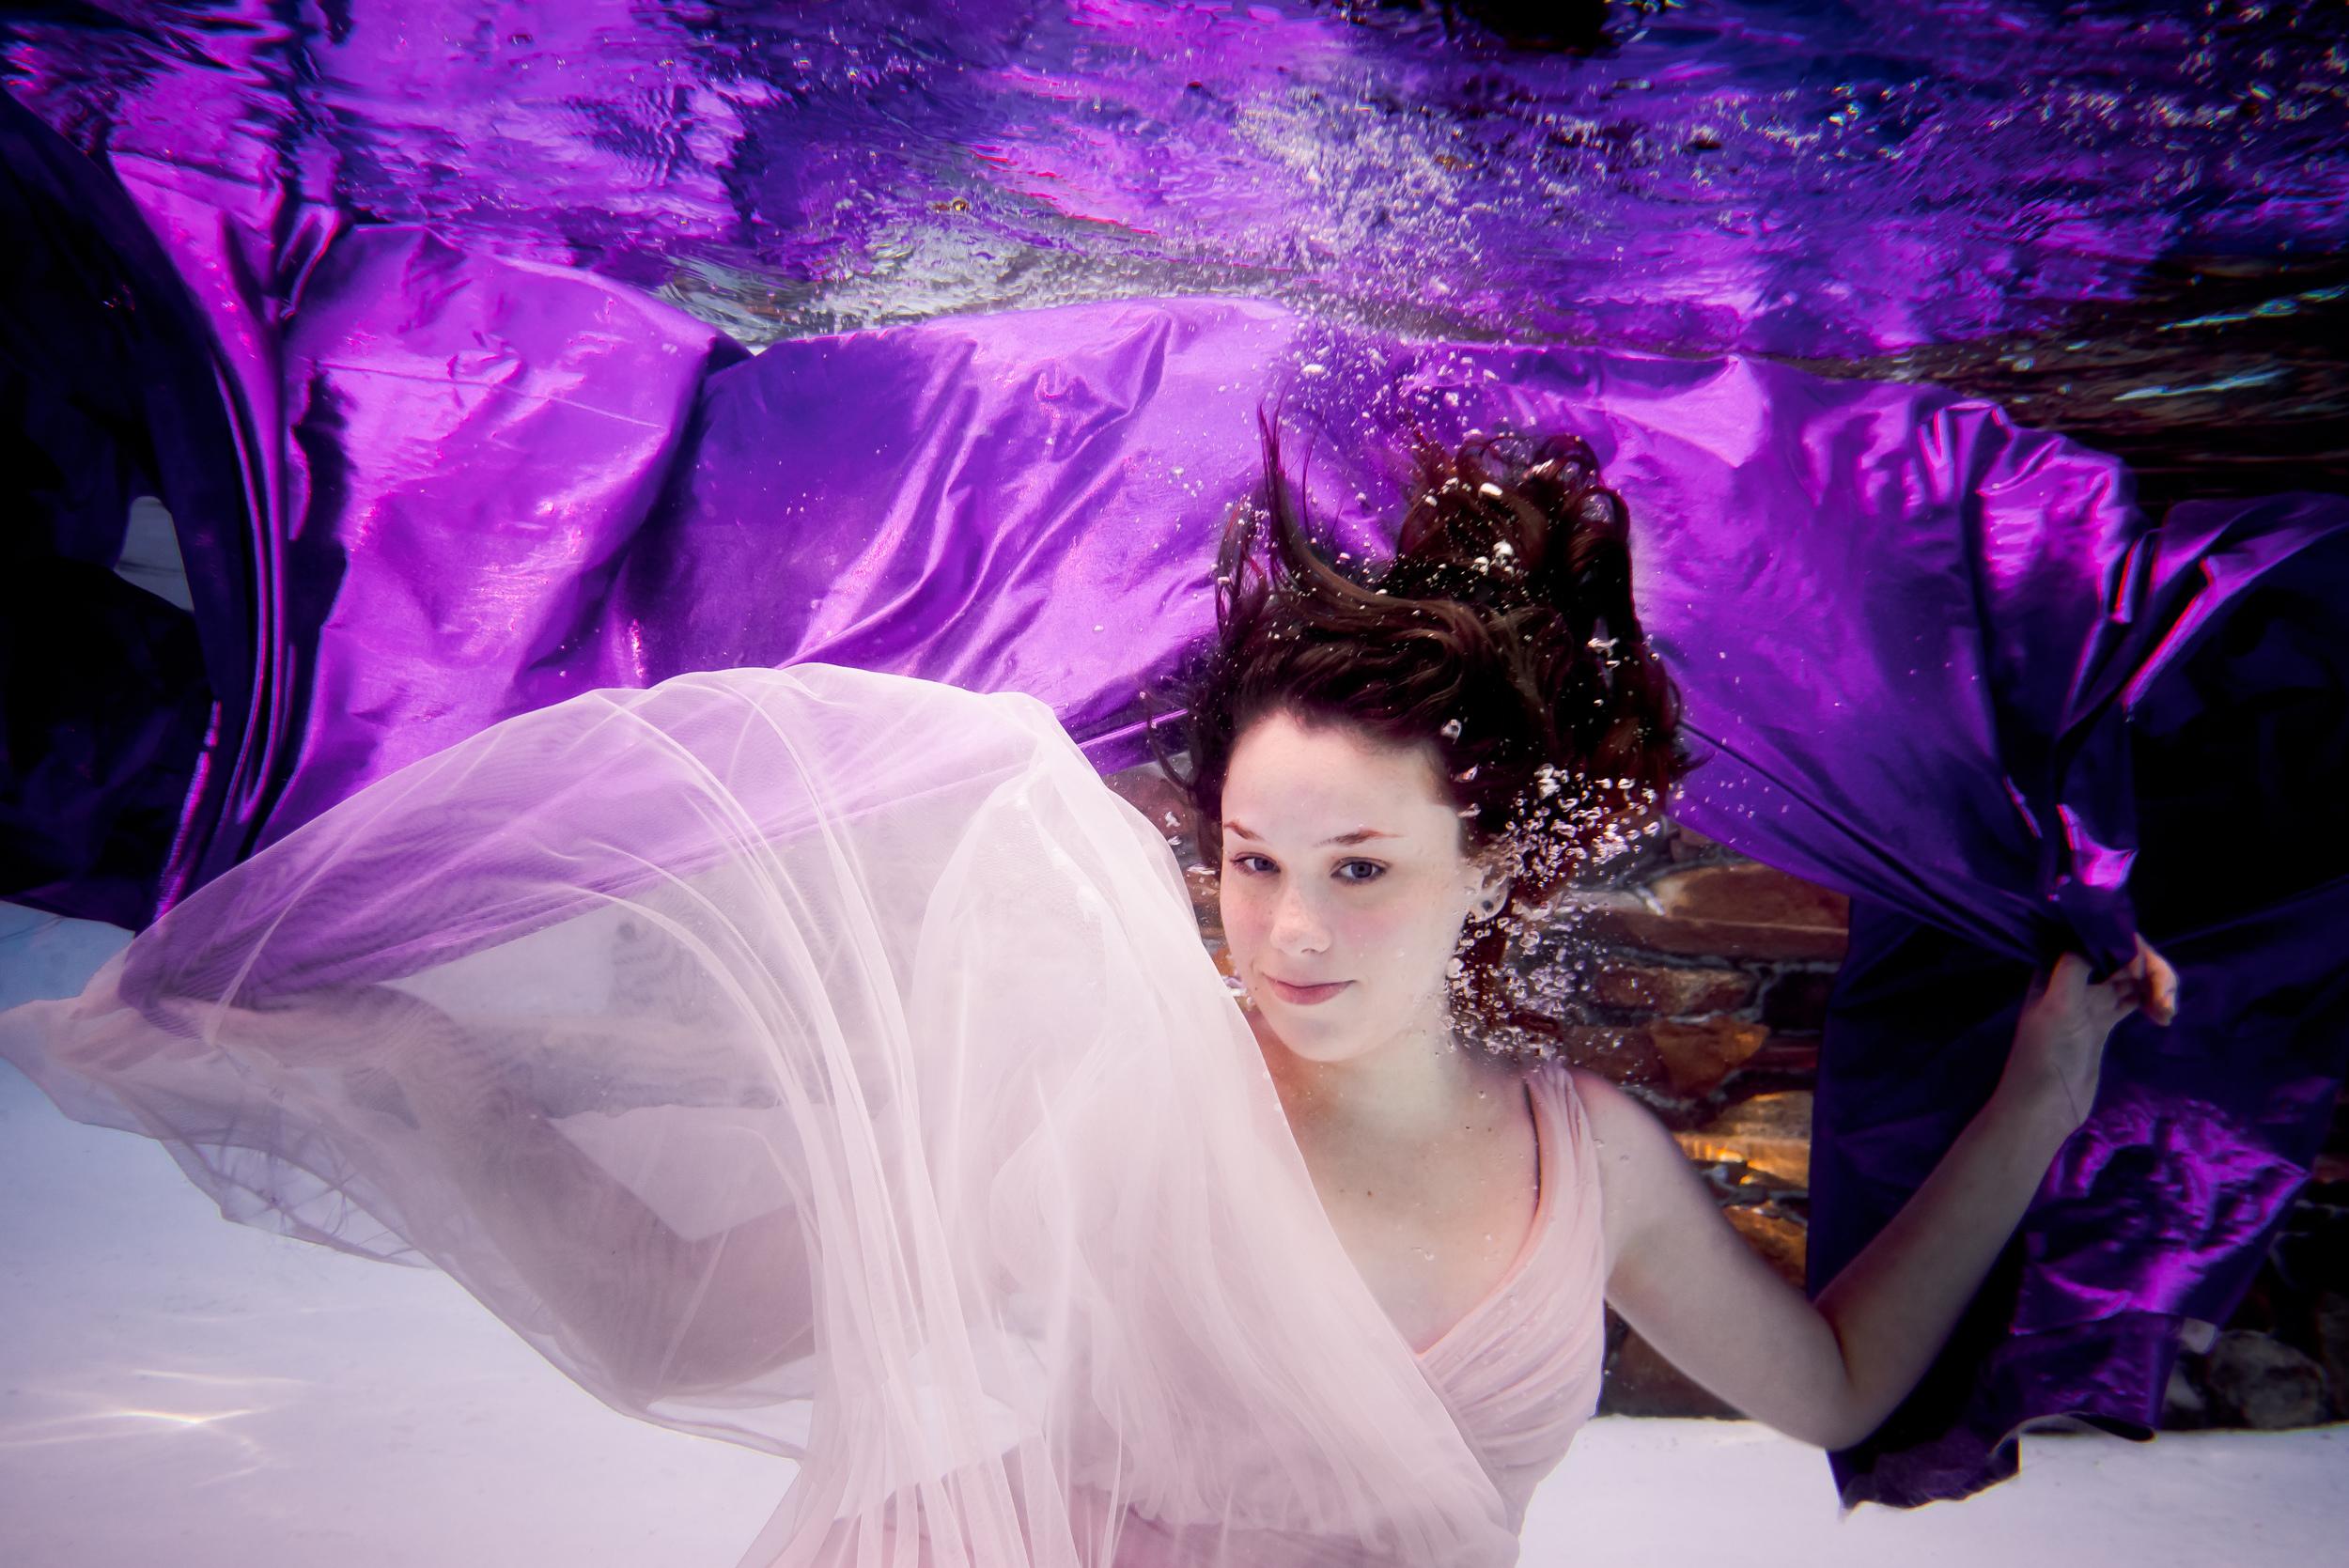 Stephanie kopf photography underwater portrait